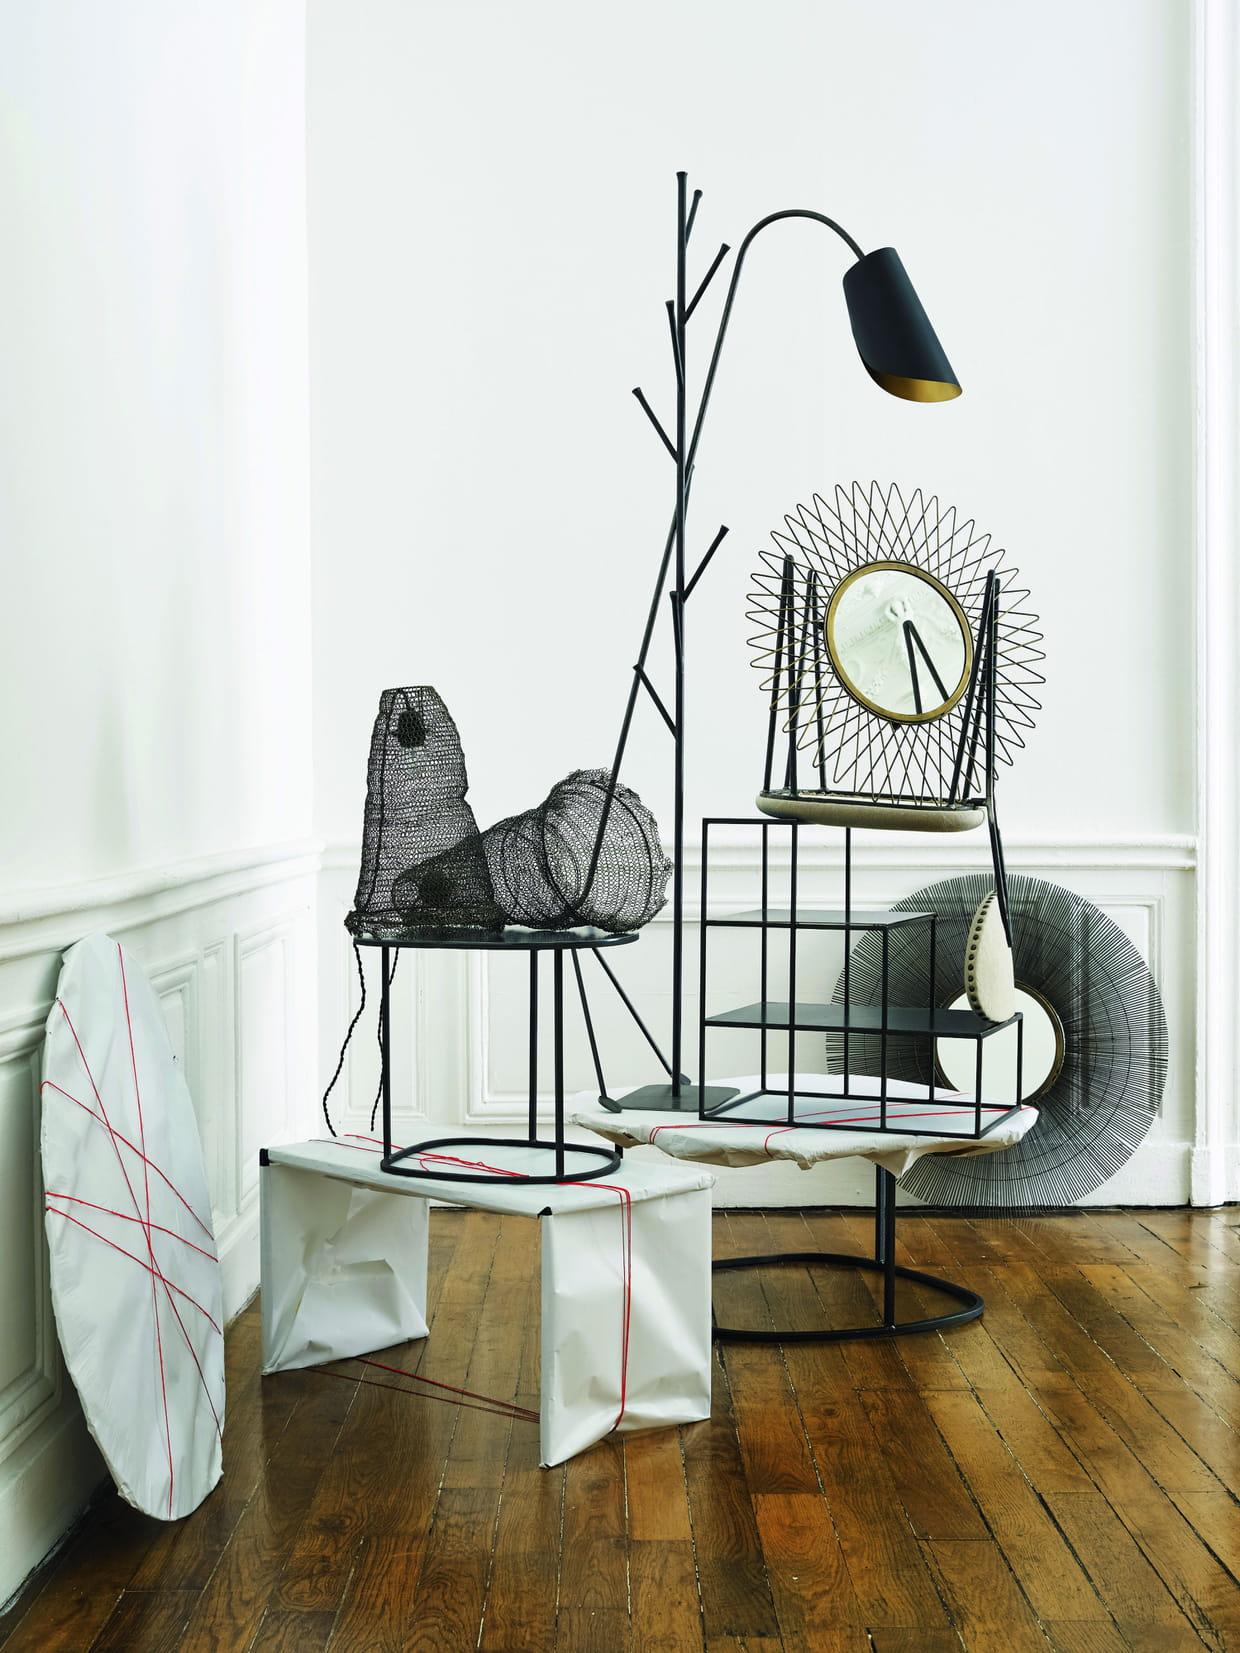 mobilier m tal de caravane. Black Bedroom Furniture Sets. Home Design Ideas